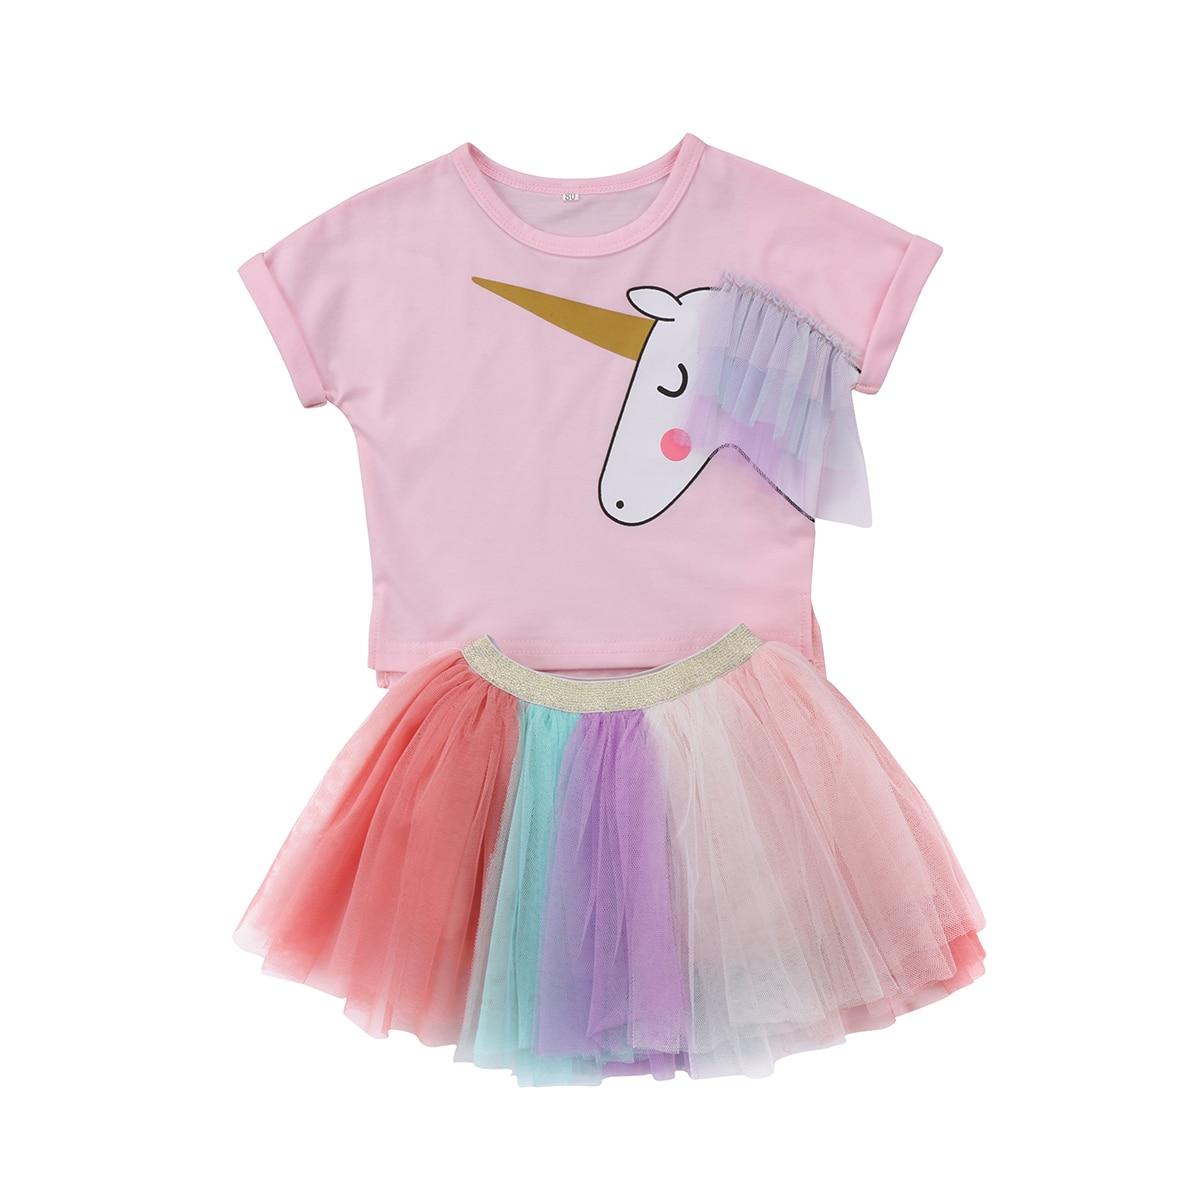 Capretti Neonate Stampati T-Shirt Top + Lace Skirt Tutu Outfit Set Abbigliamento Estate